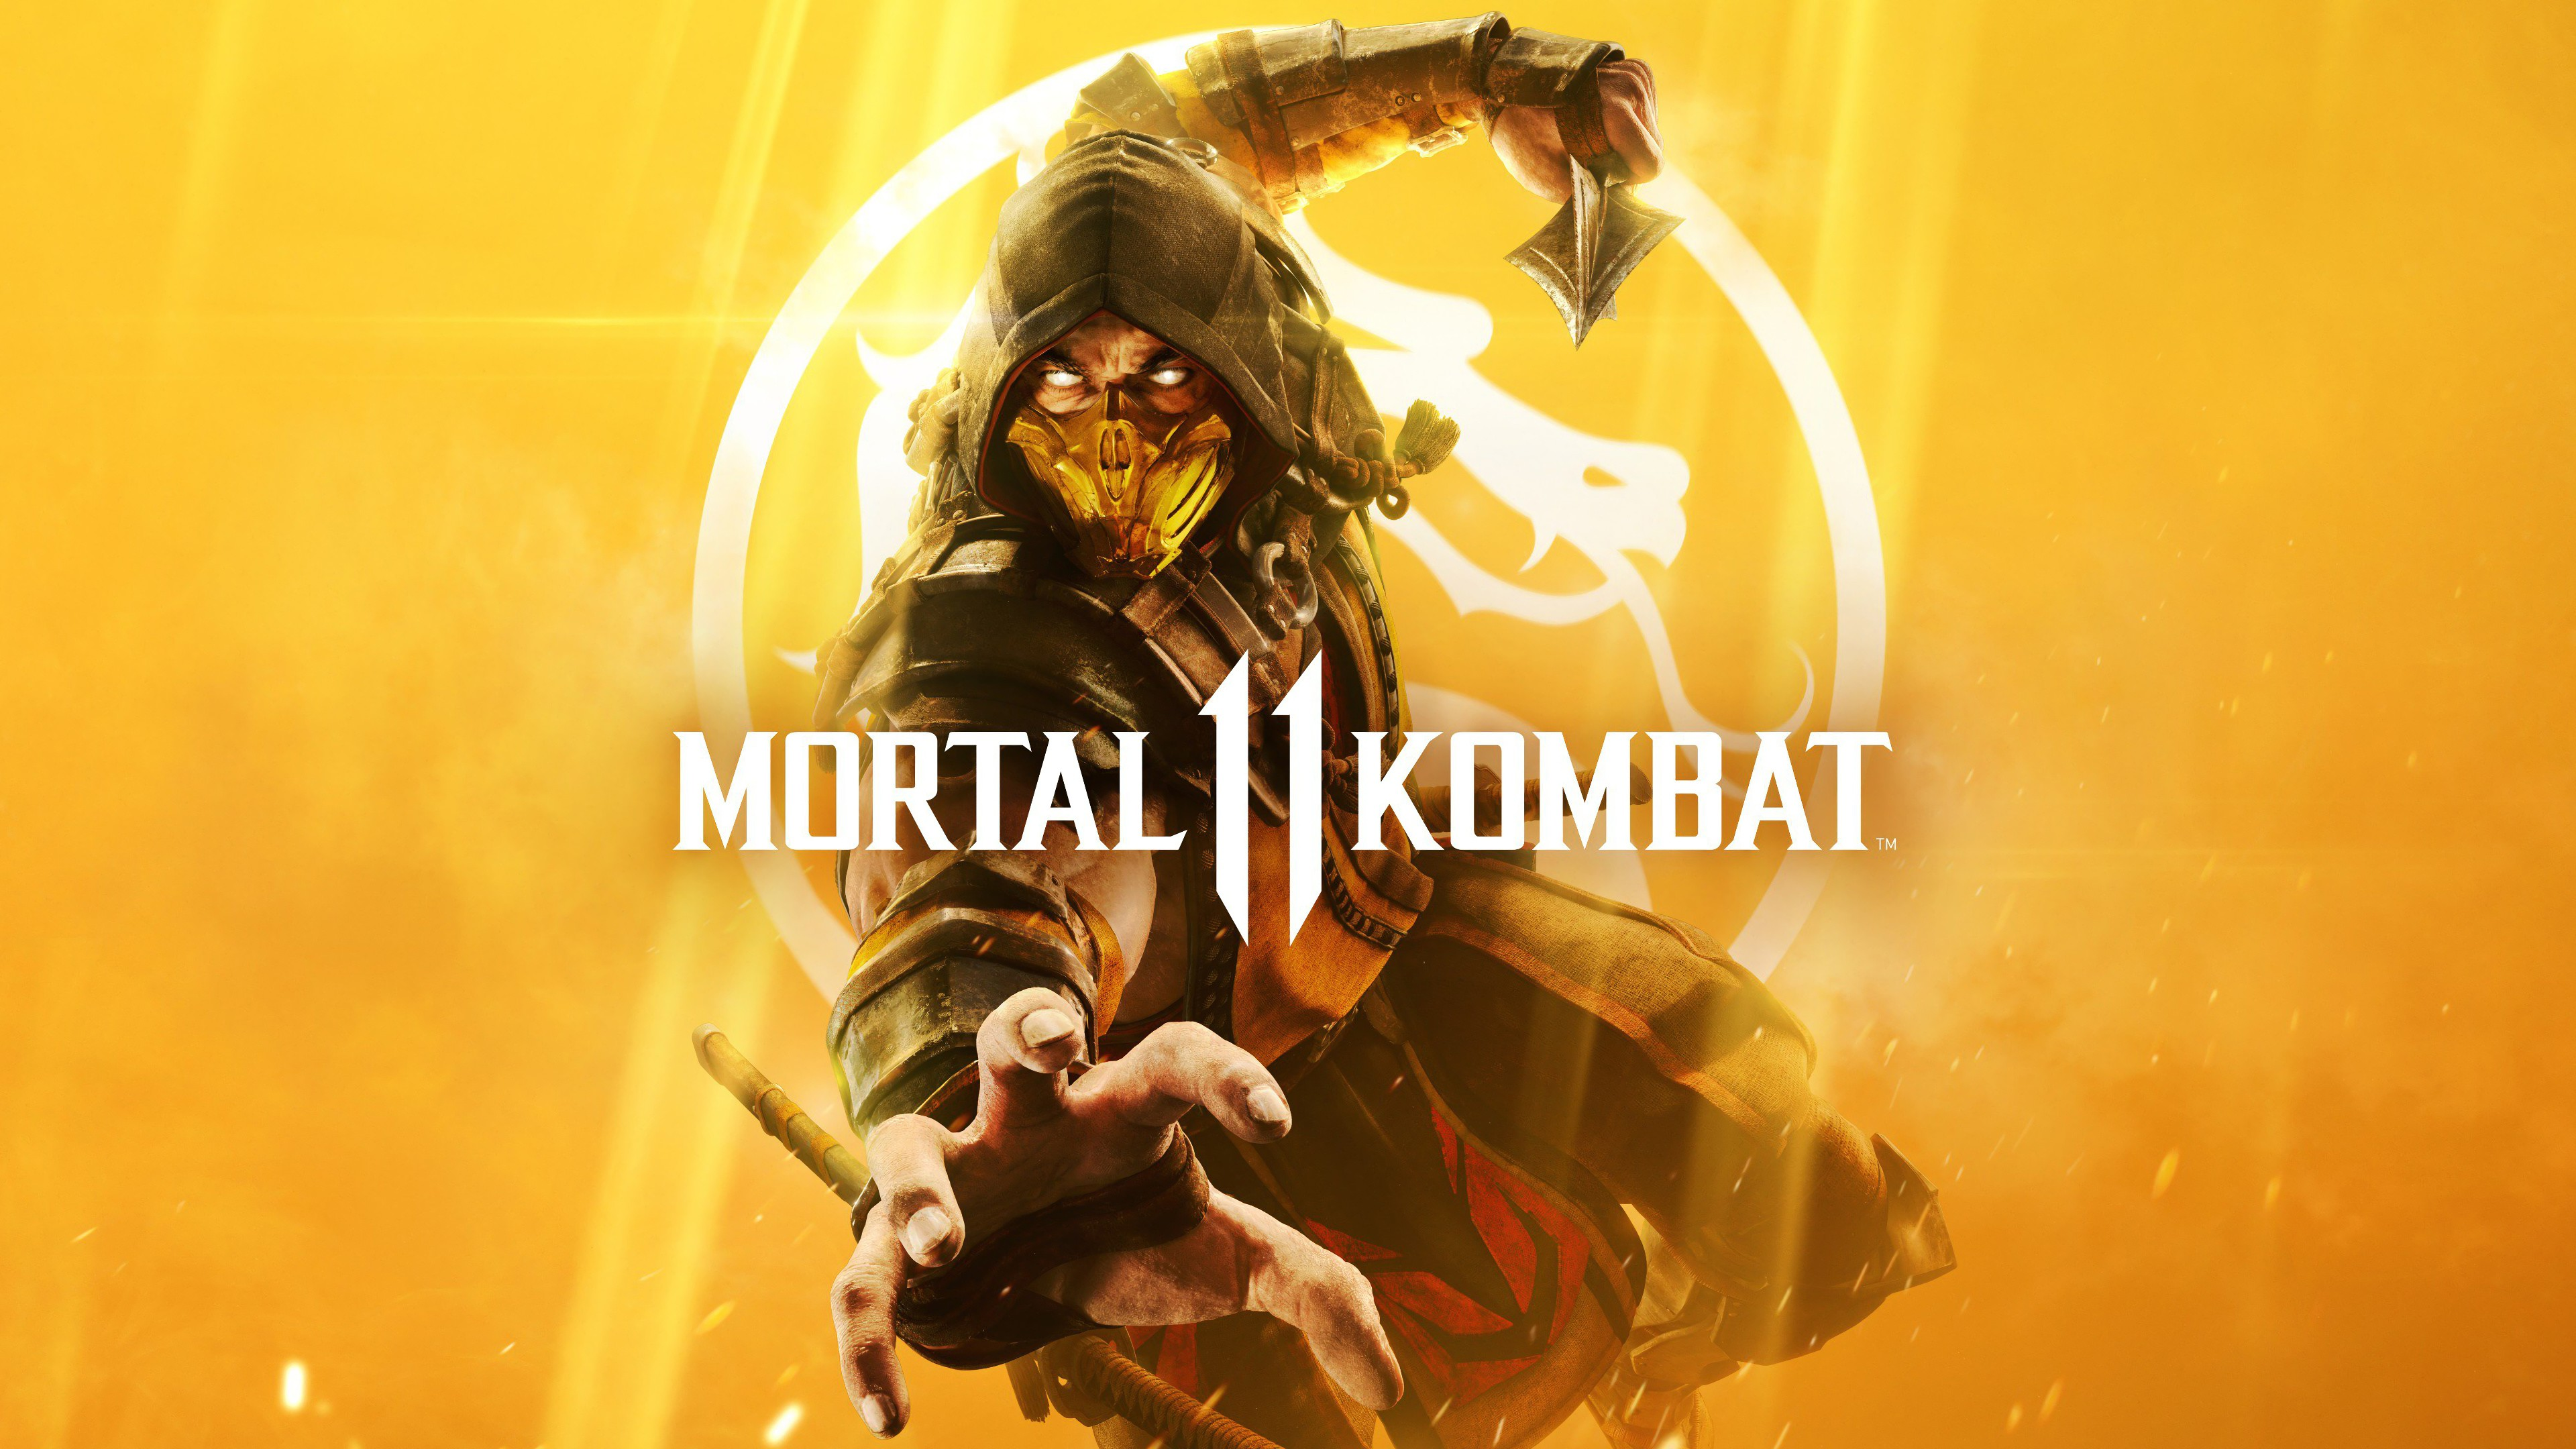 Fondos de pantalla Mortal Kombat 11 Scorpion